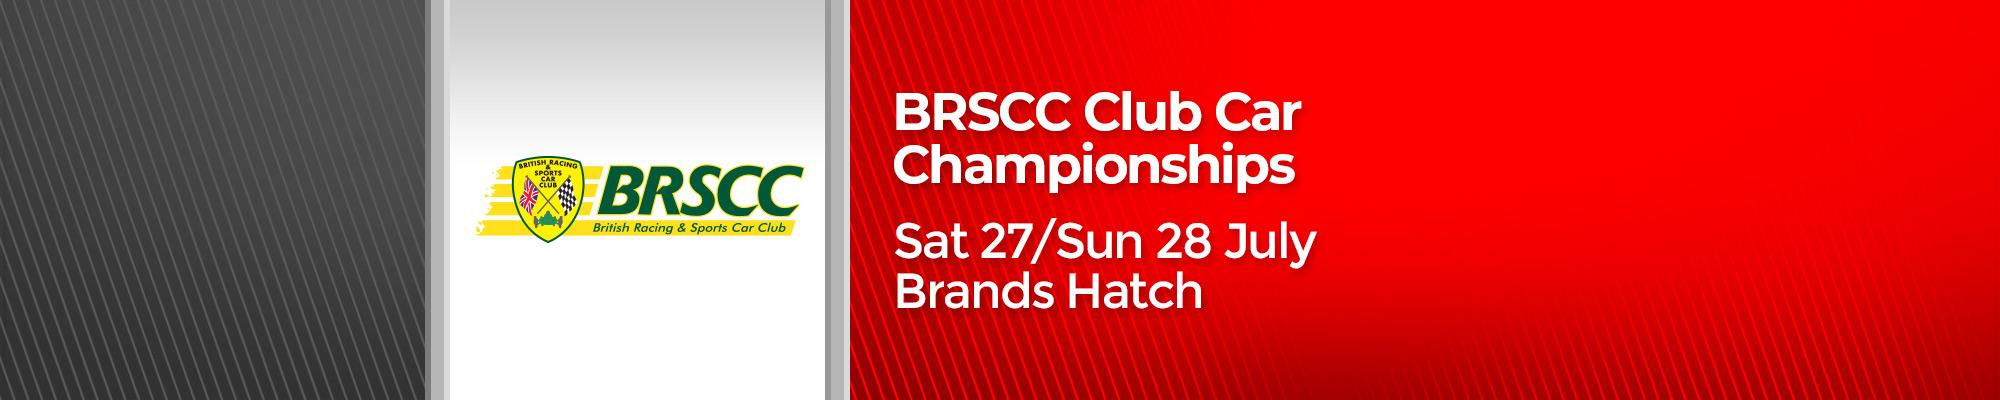 TCR UK Race Weekend